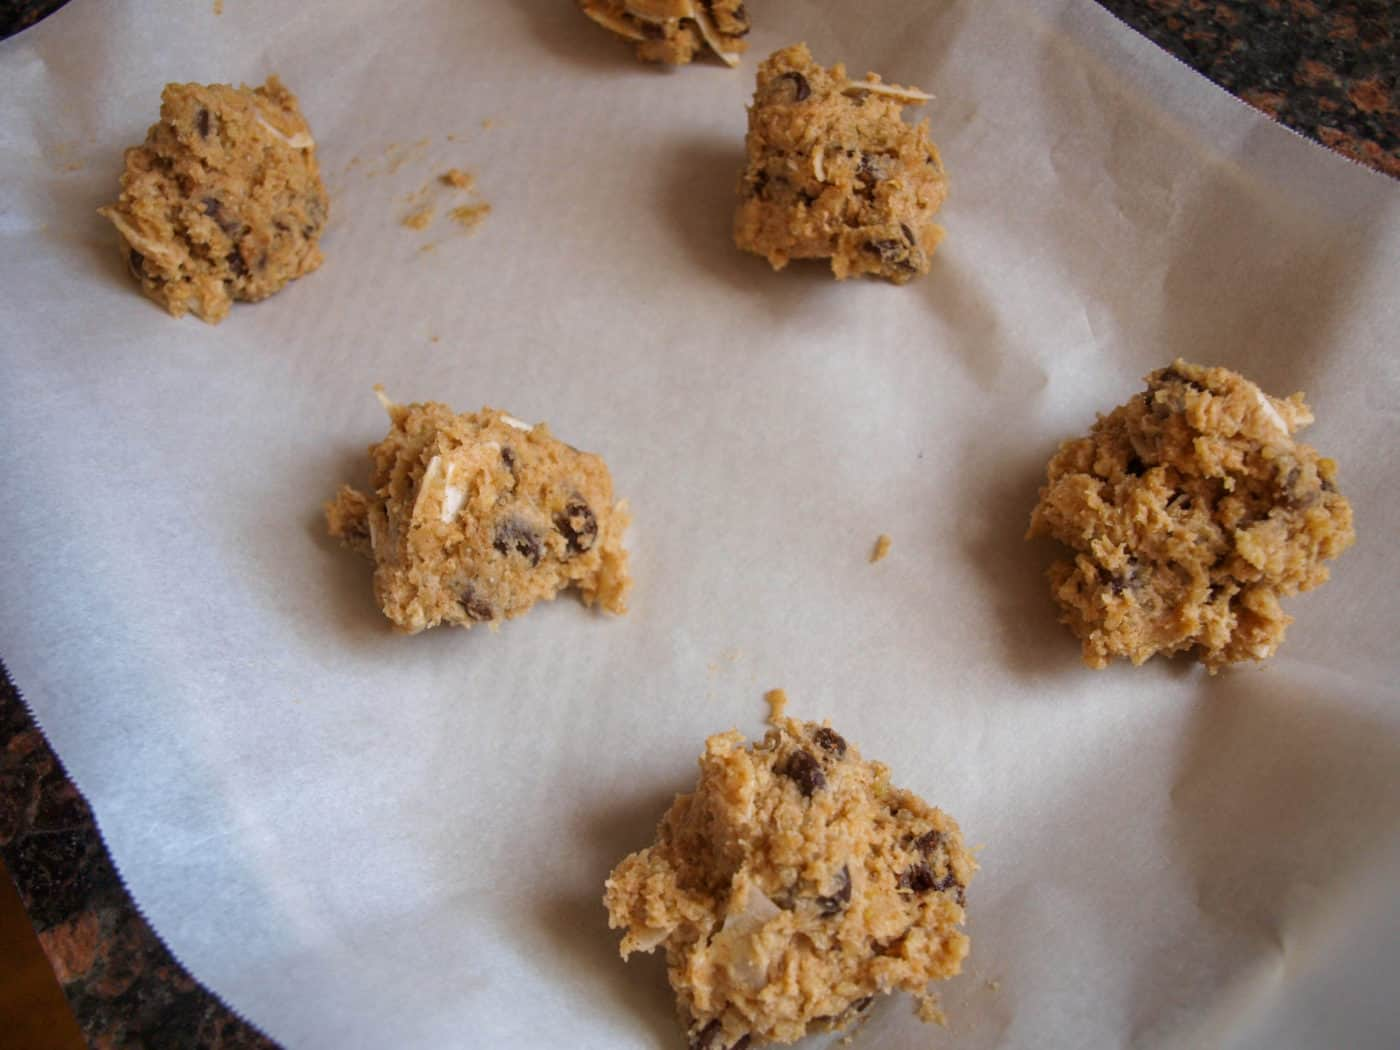 Scooping Quinoa Chocolate Chip Cookies Onto The Sheet   Mae's Menu